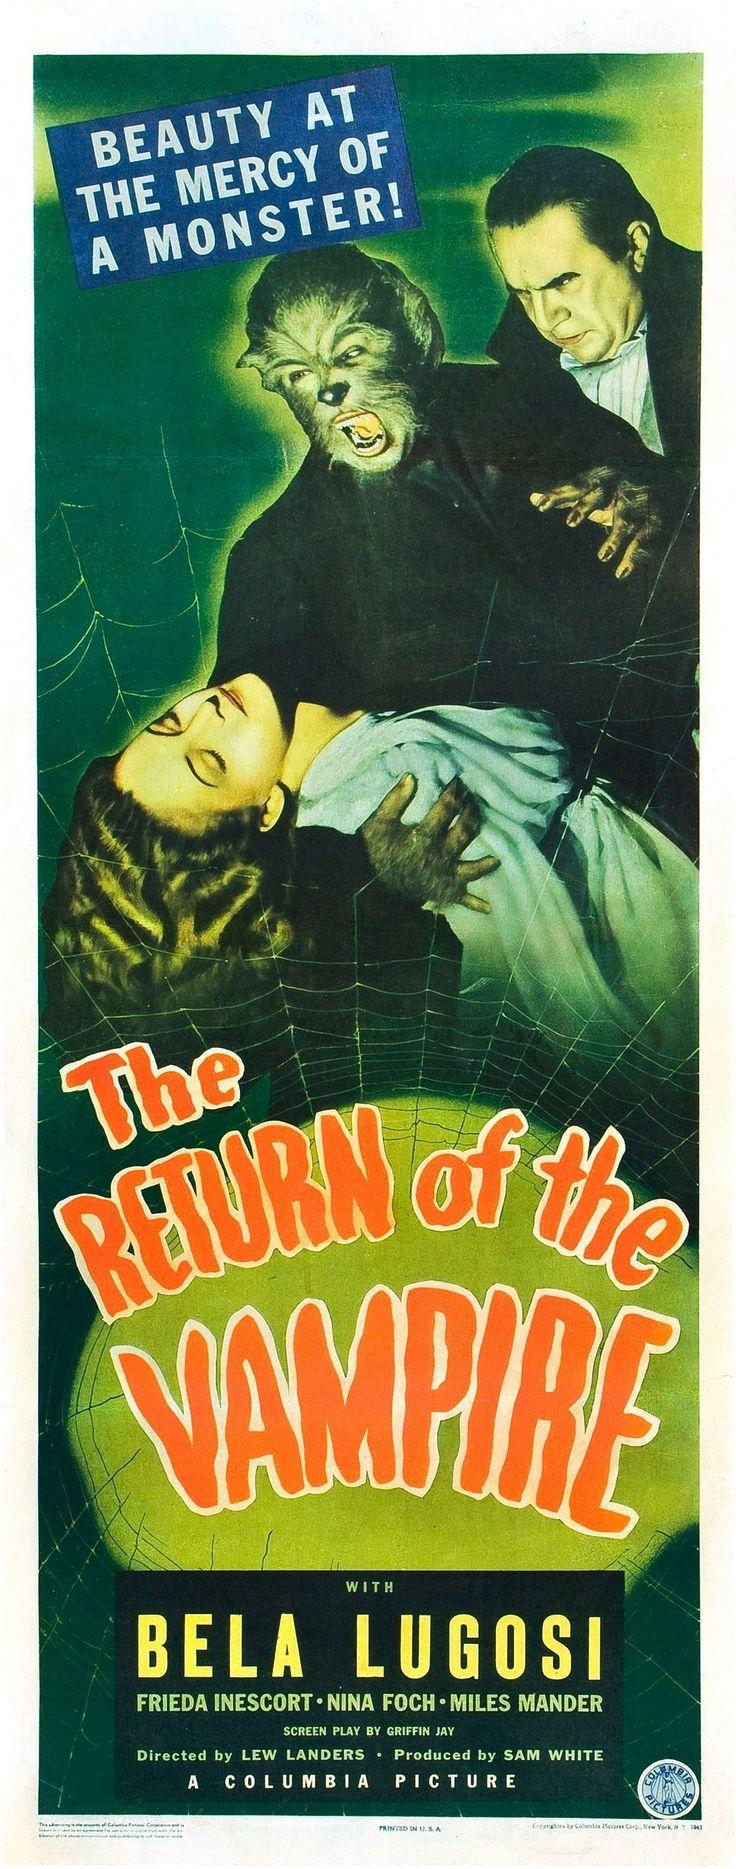 Return of the Vampire (1944) - Bela Lugosi